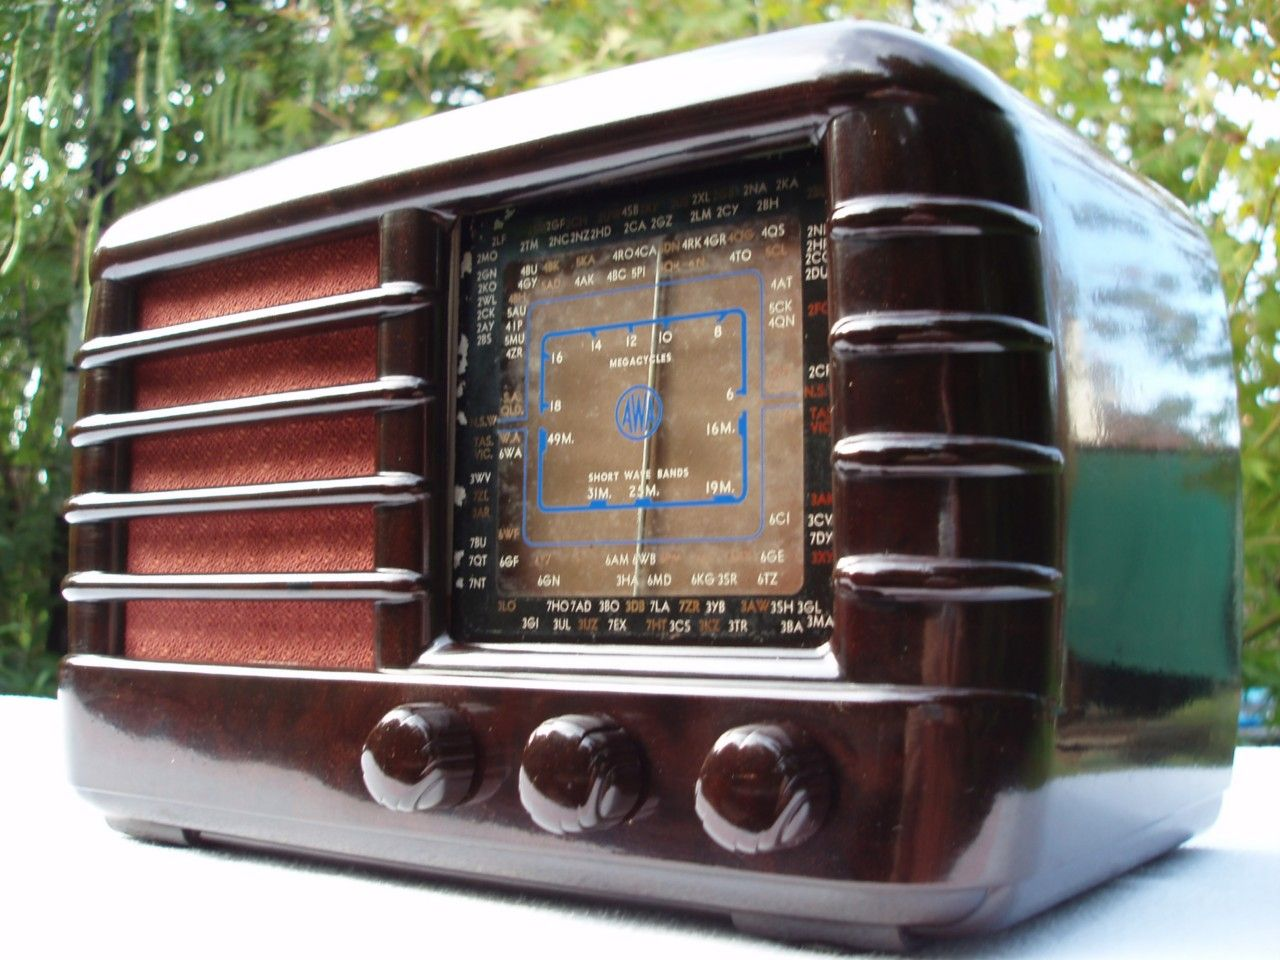 Deco Vintage 40s Awa Radiola Bakelite Valve Radio For Sale